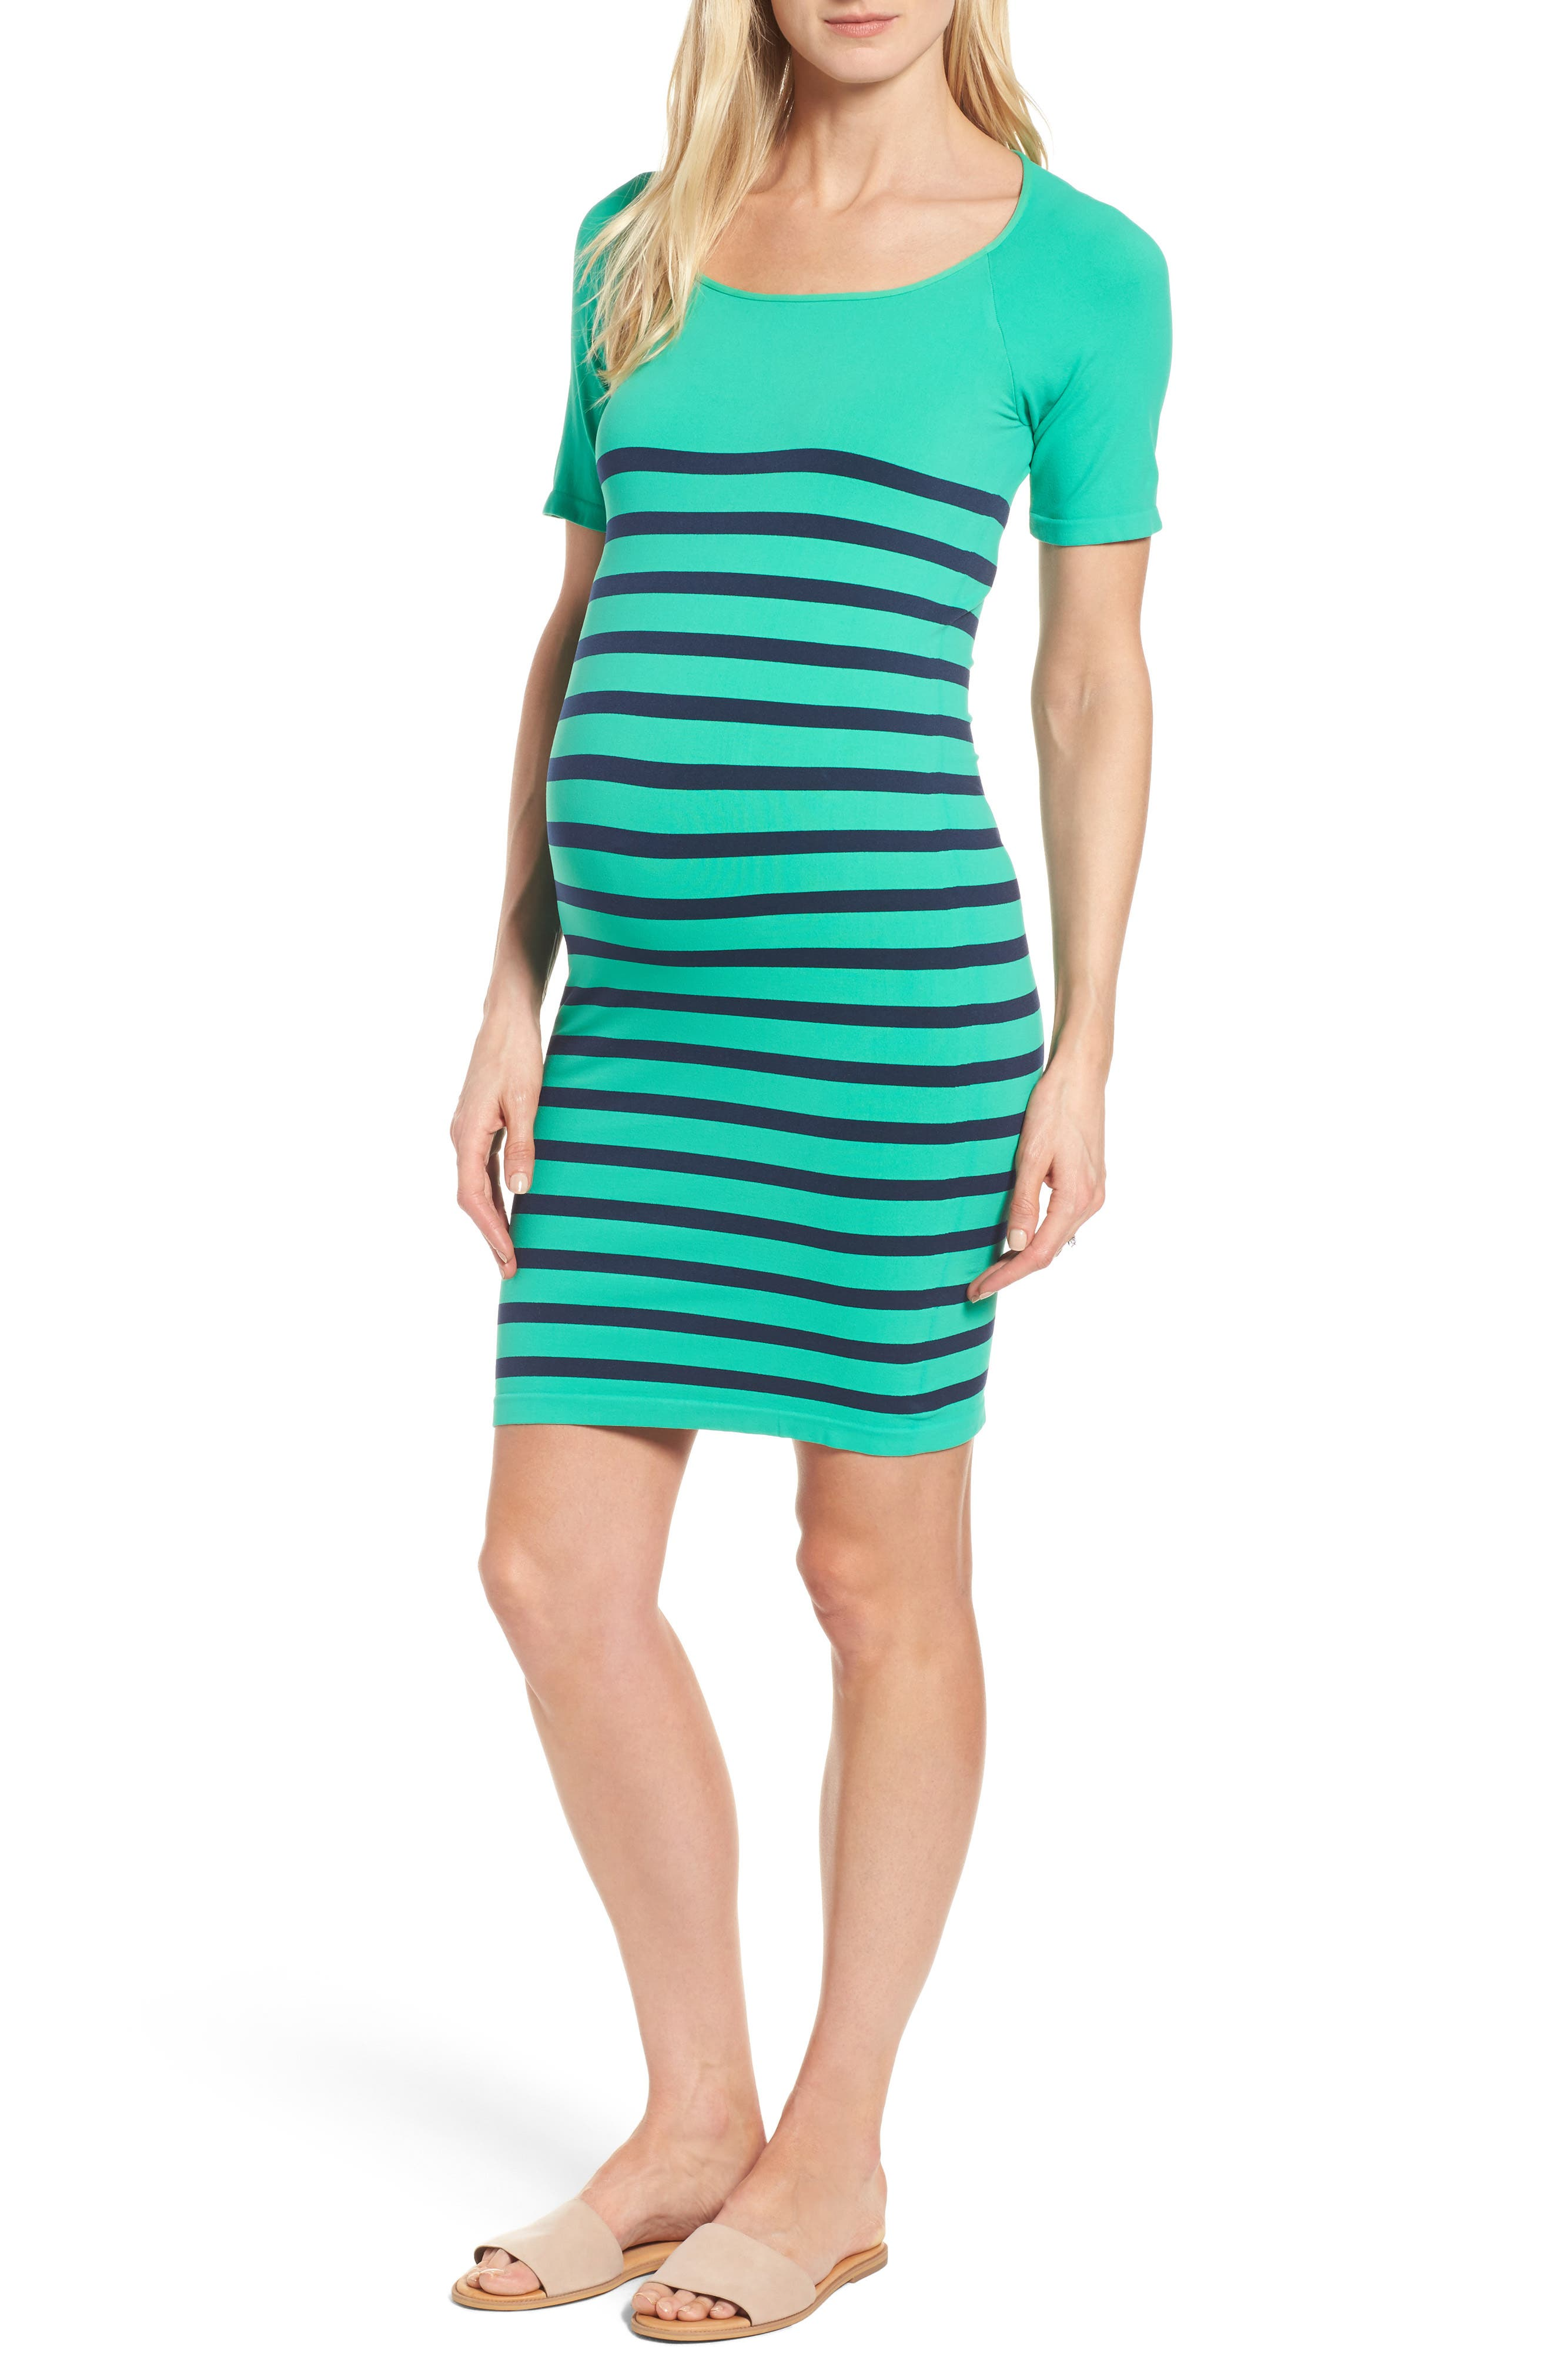 'Nautical' Short Sleeve Maternity Dress,                         Main,                         color, Green/ Navy